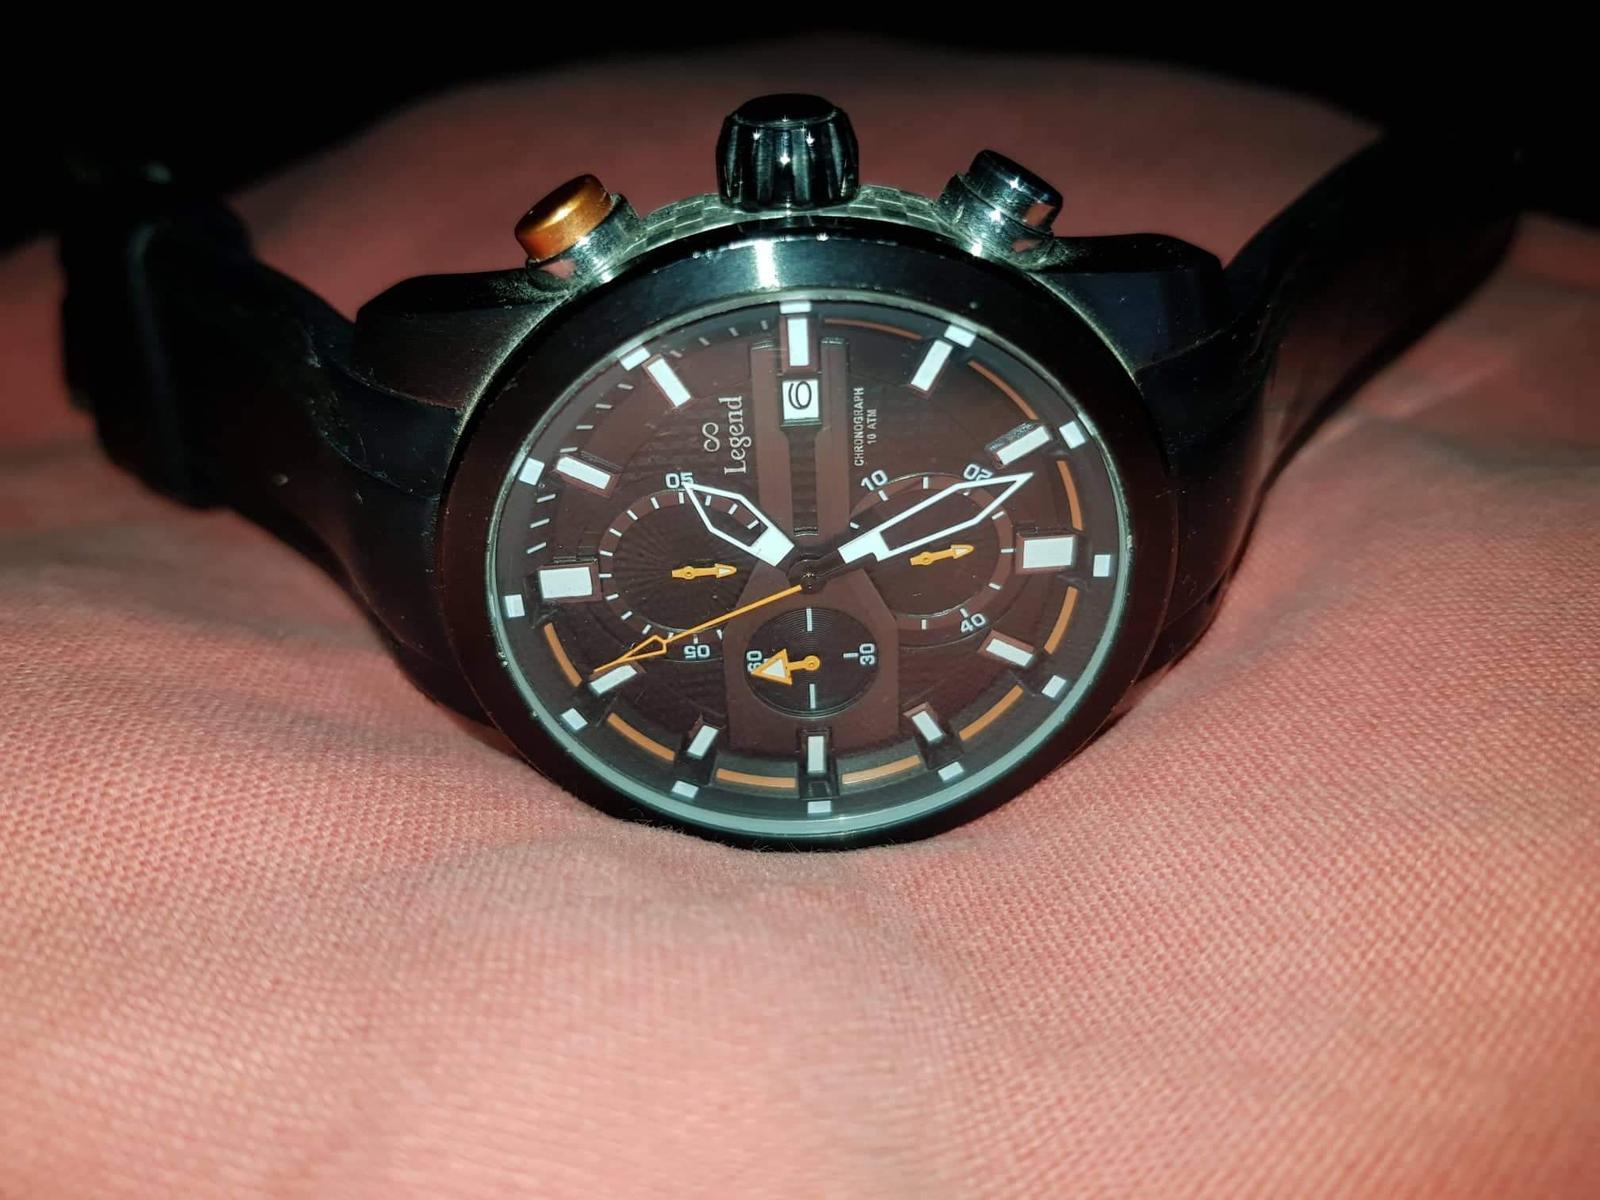 Štýlové hodinky LEGEND - Obrázok č. 1